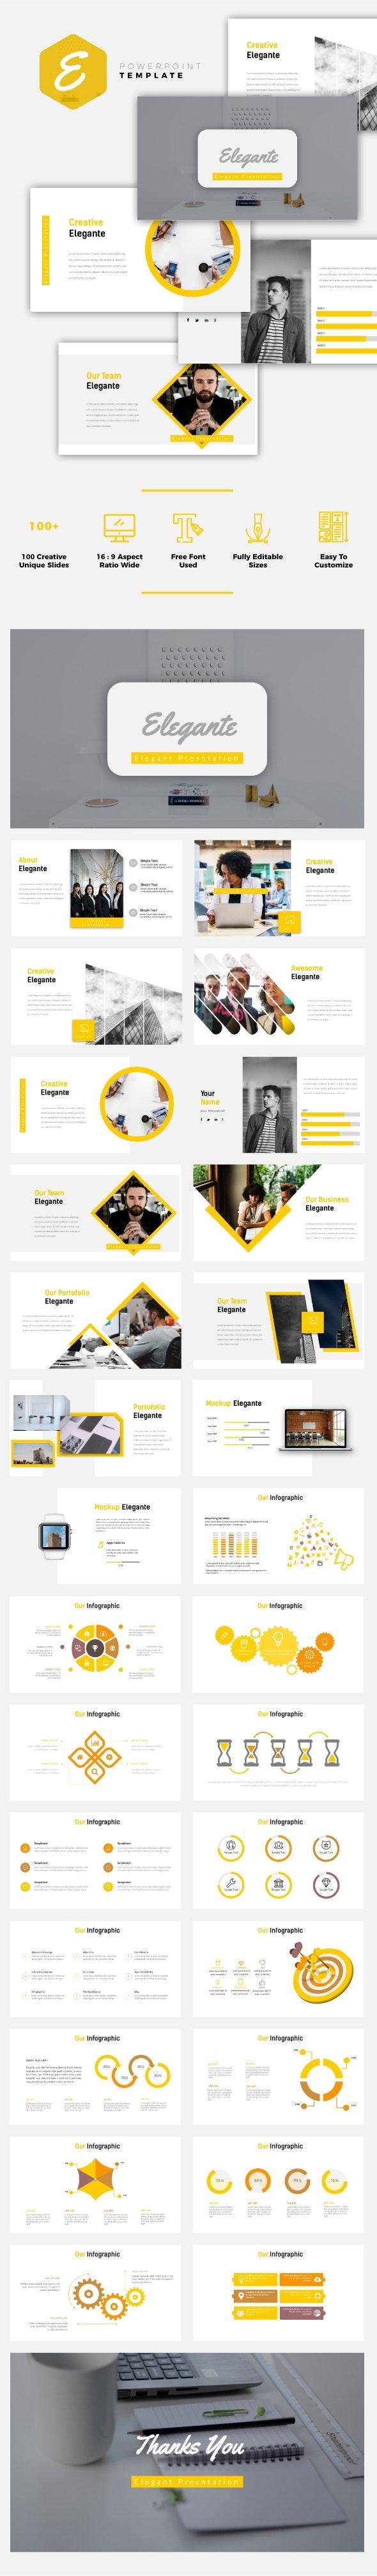 Elegante - Business Powerpoint Template - Business PowerPoint Templates